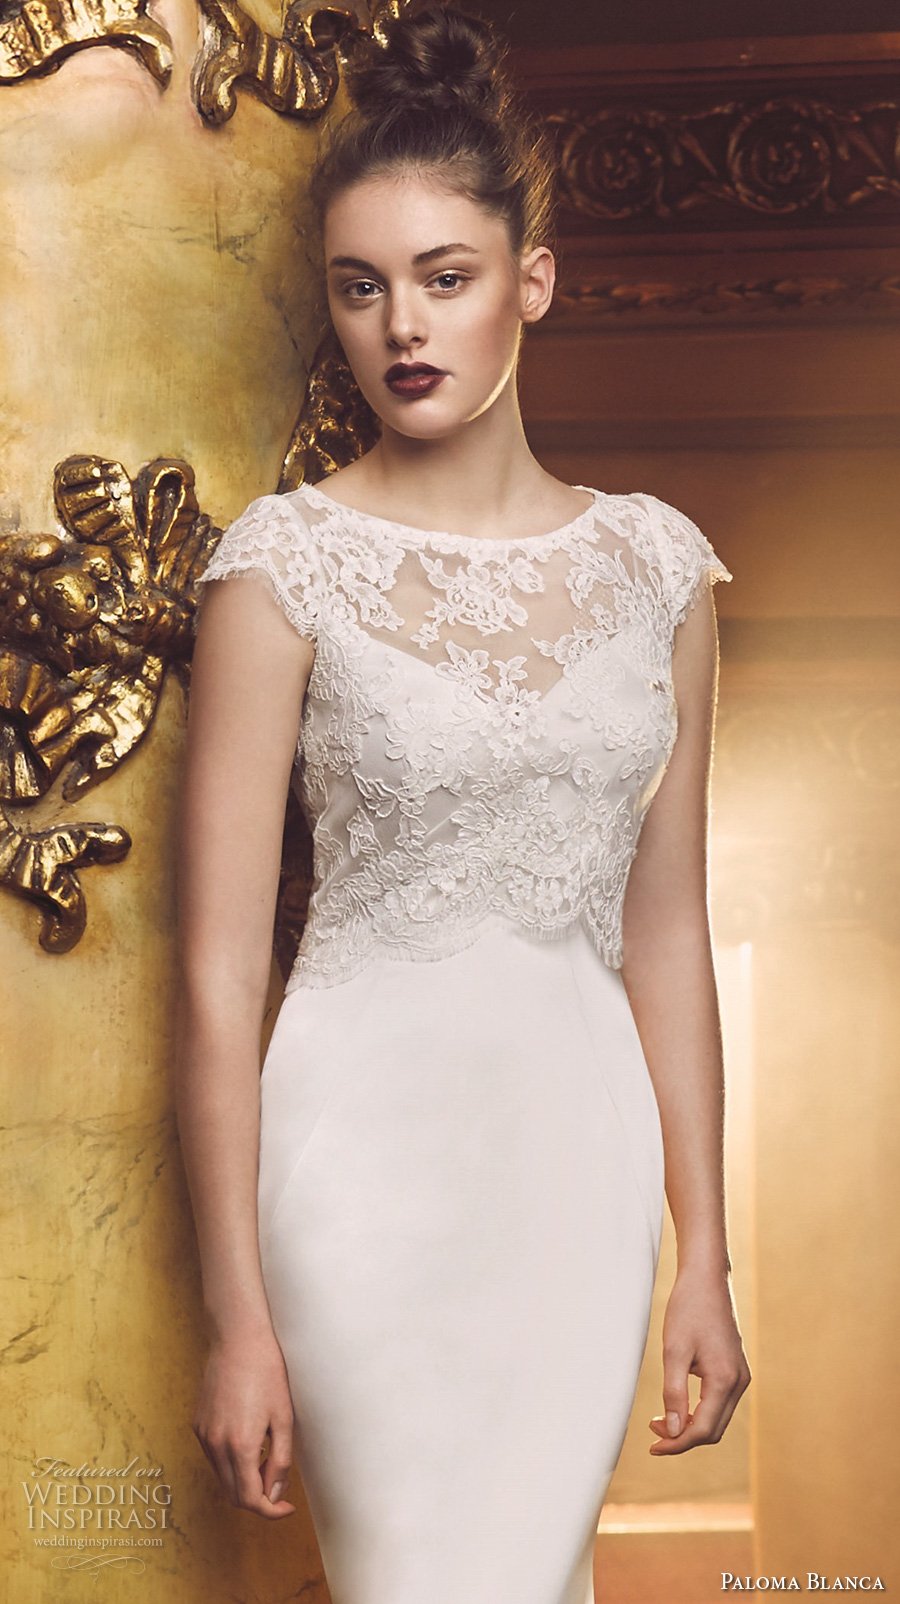 Paloma blanca fall 2016 wedding dresses wedding inspirasi for Lace shrugs for wedding dresses